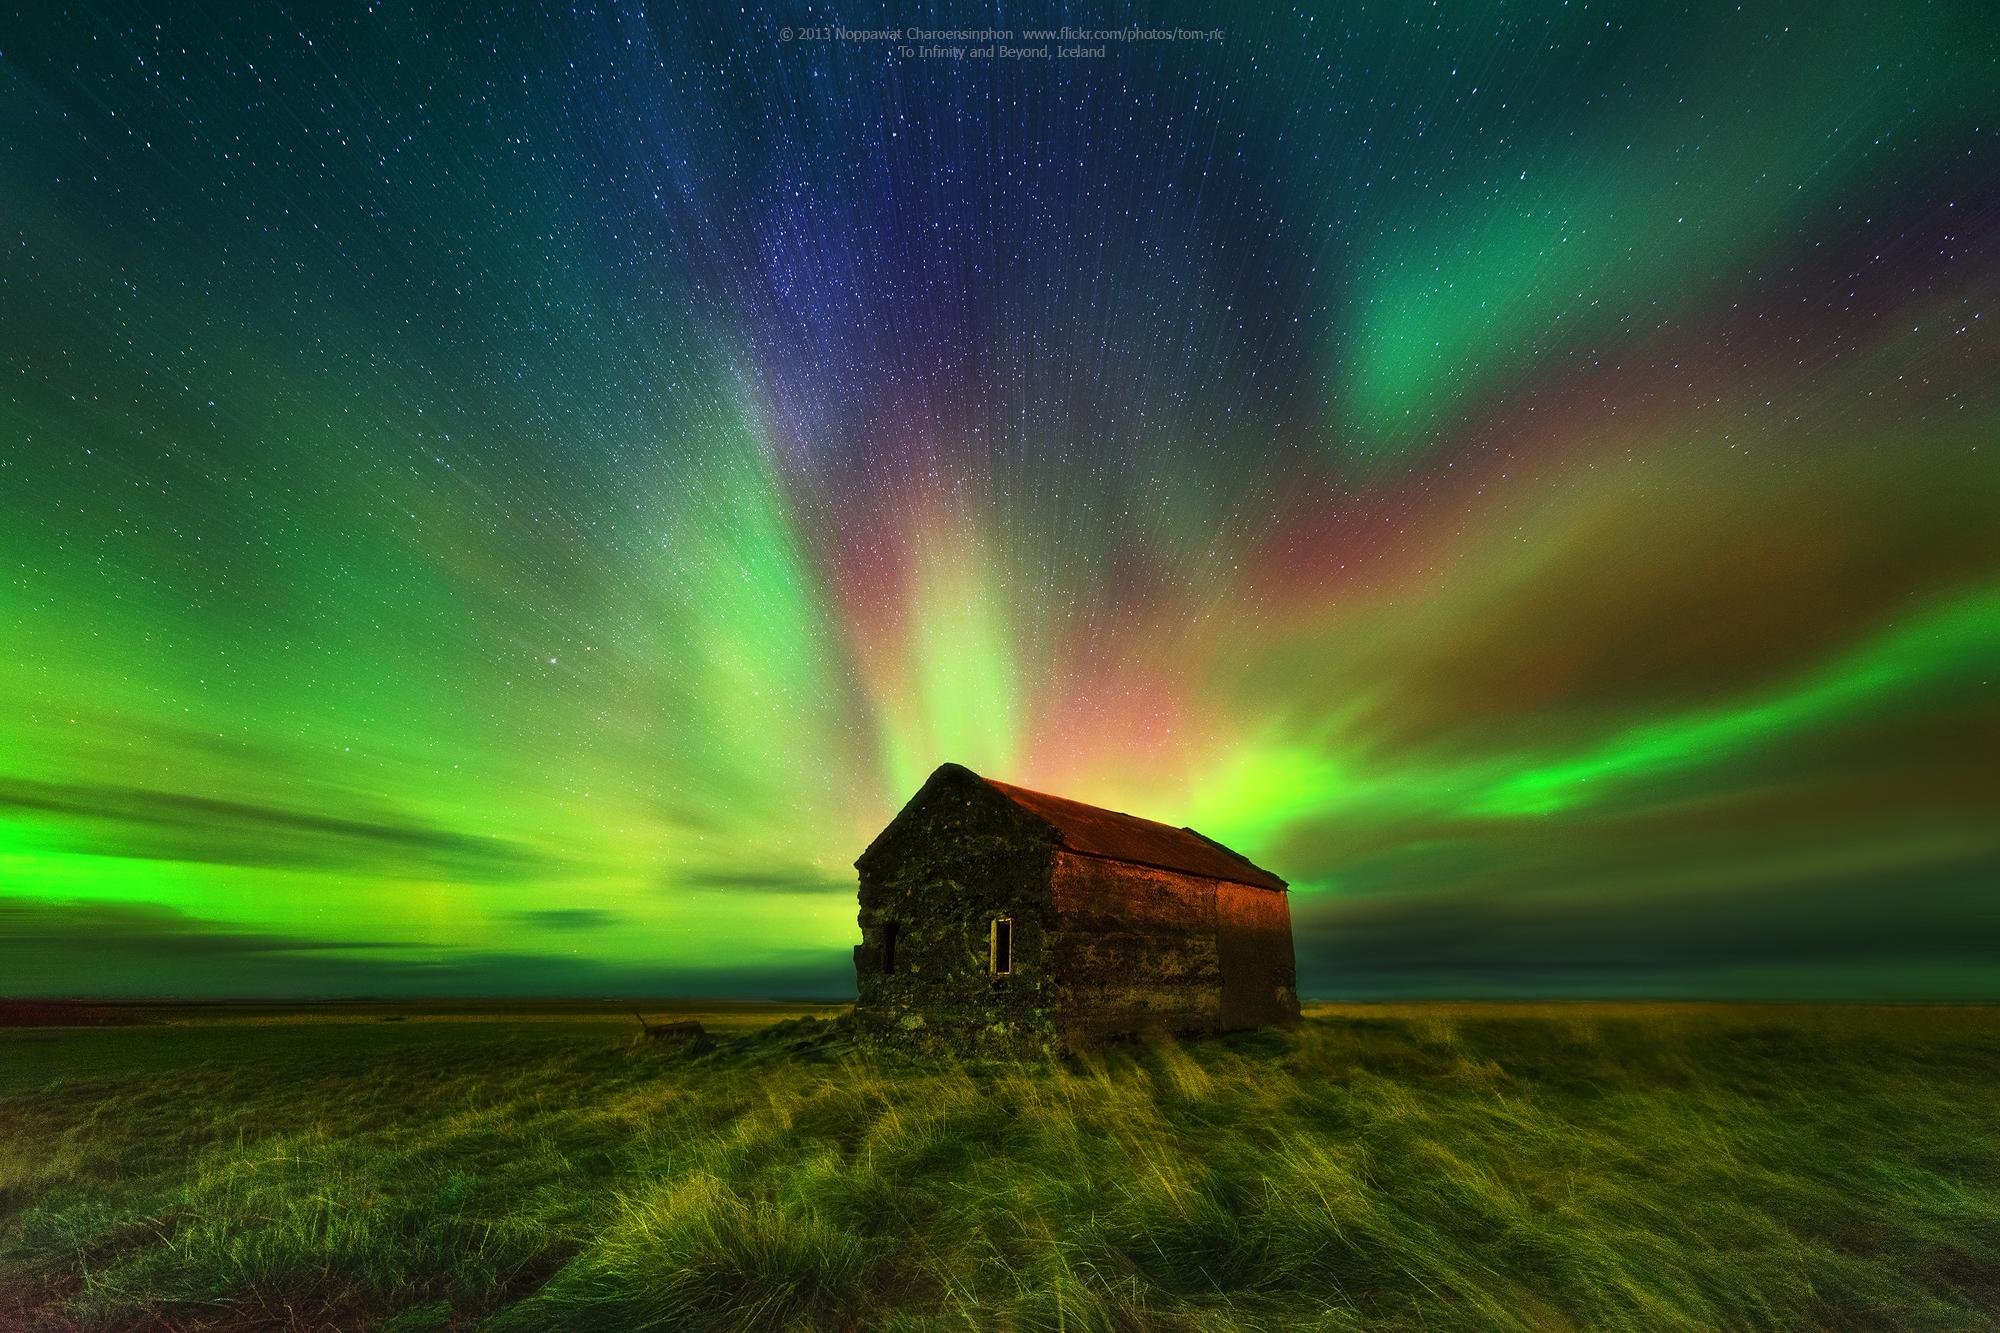 Sfondi paesaggio stelle verde freddo atmosfera for Sfondi aurora boreale